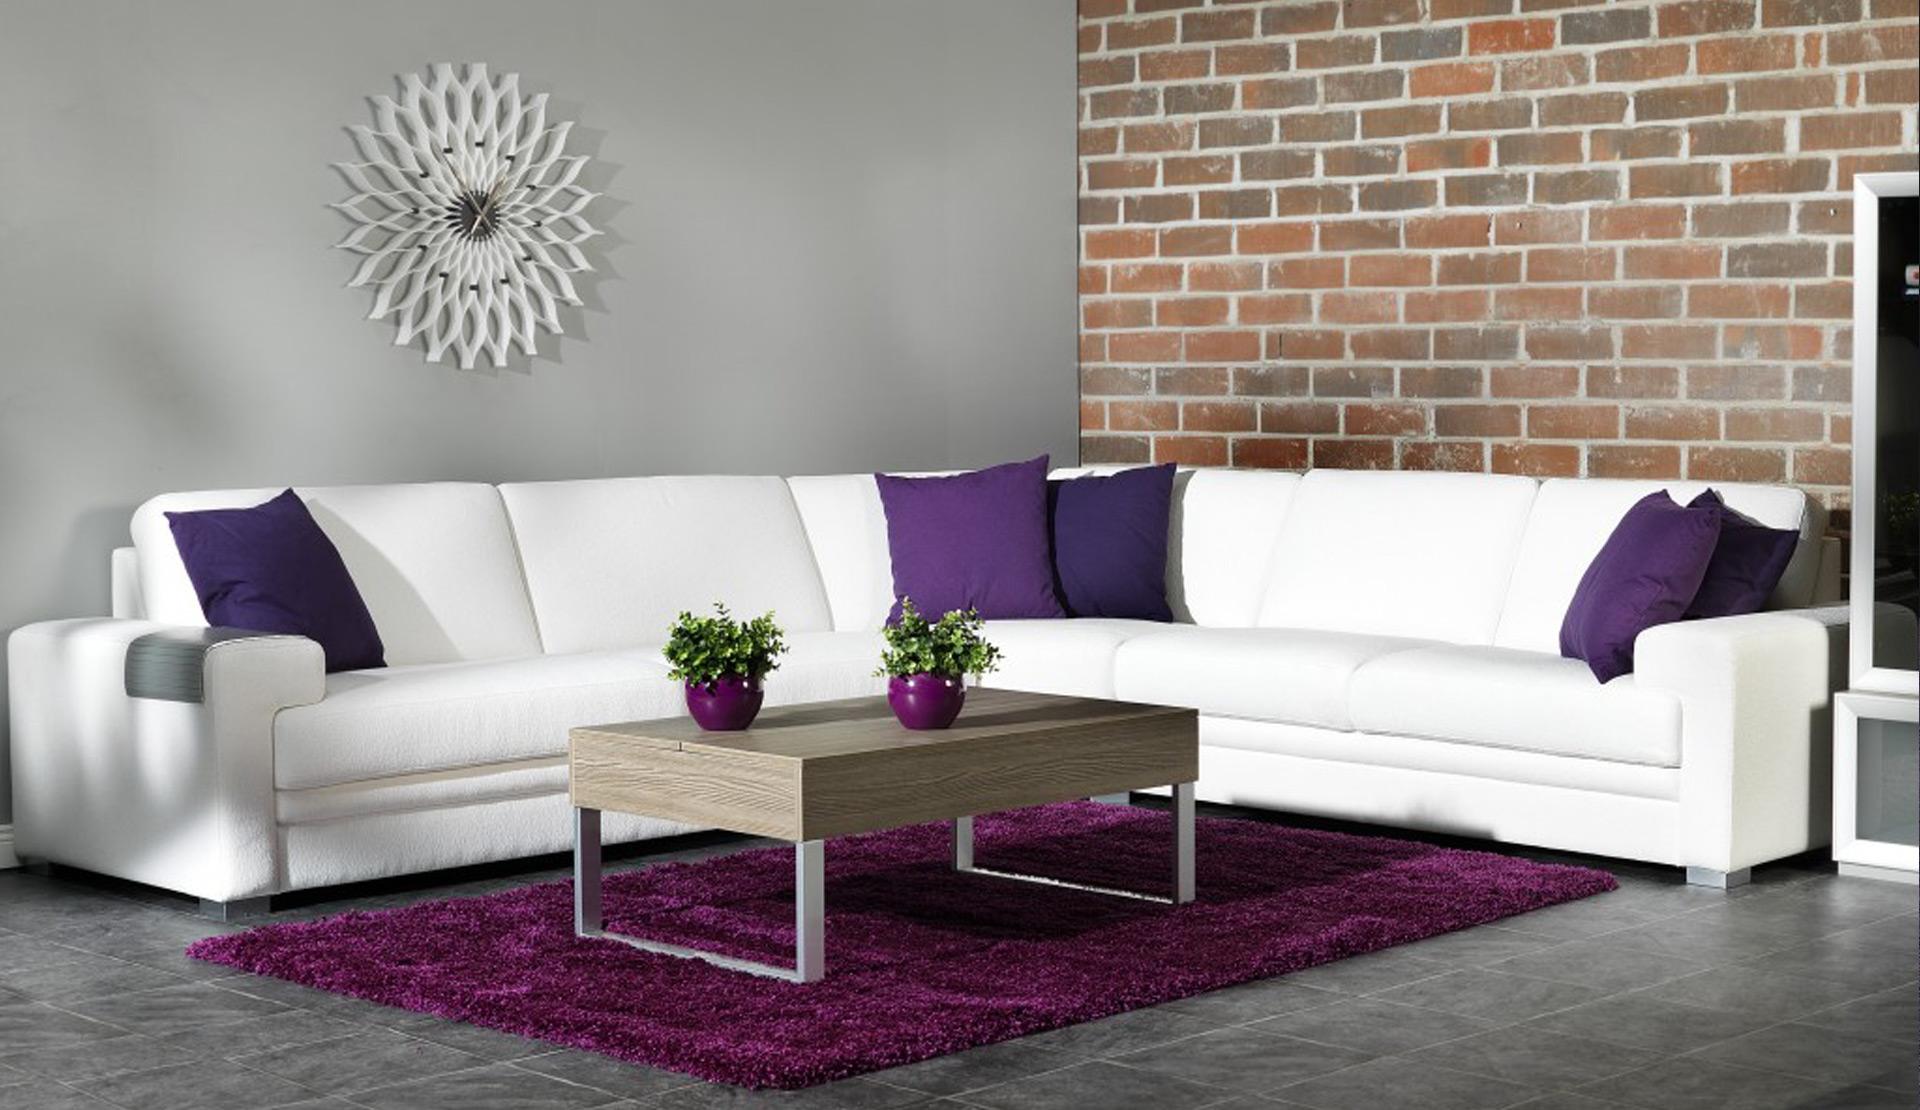 Диван с подушками контрастного цвета